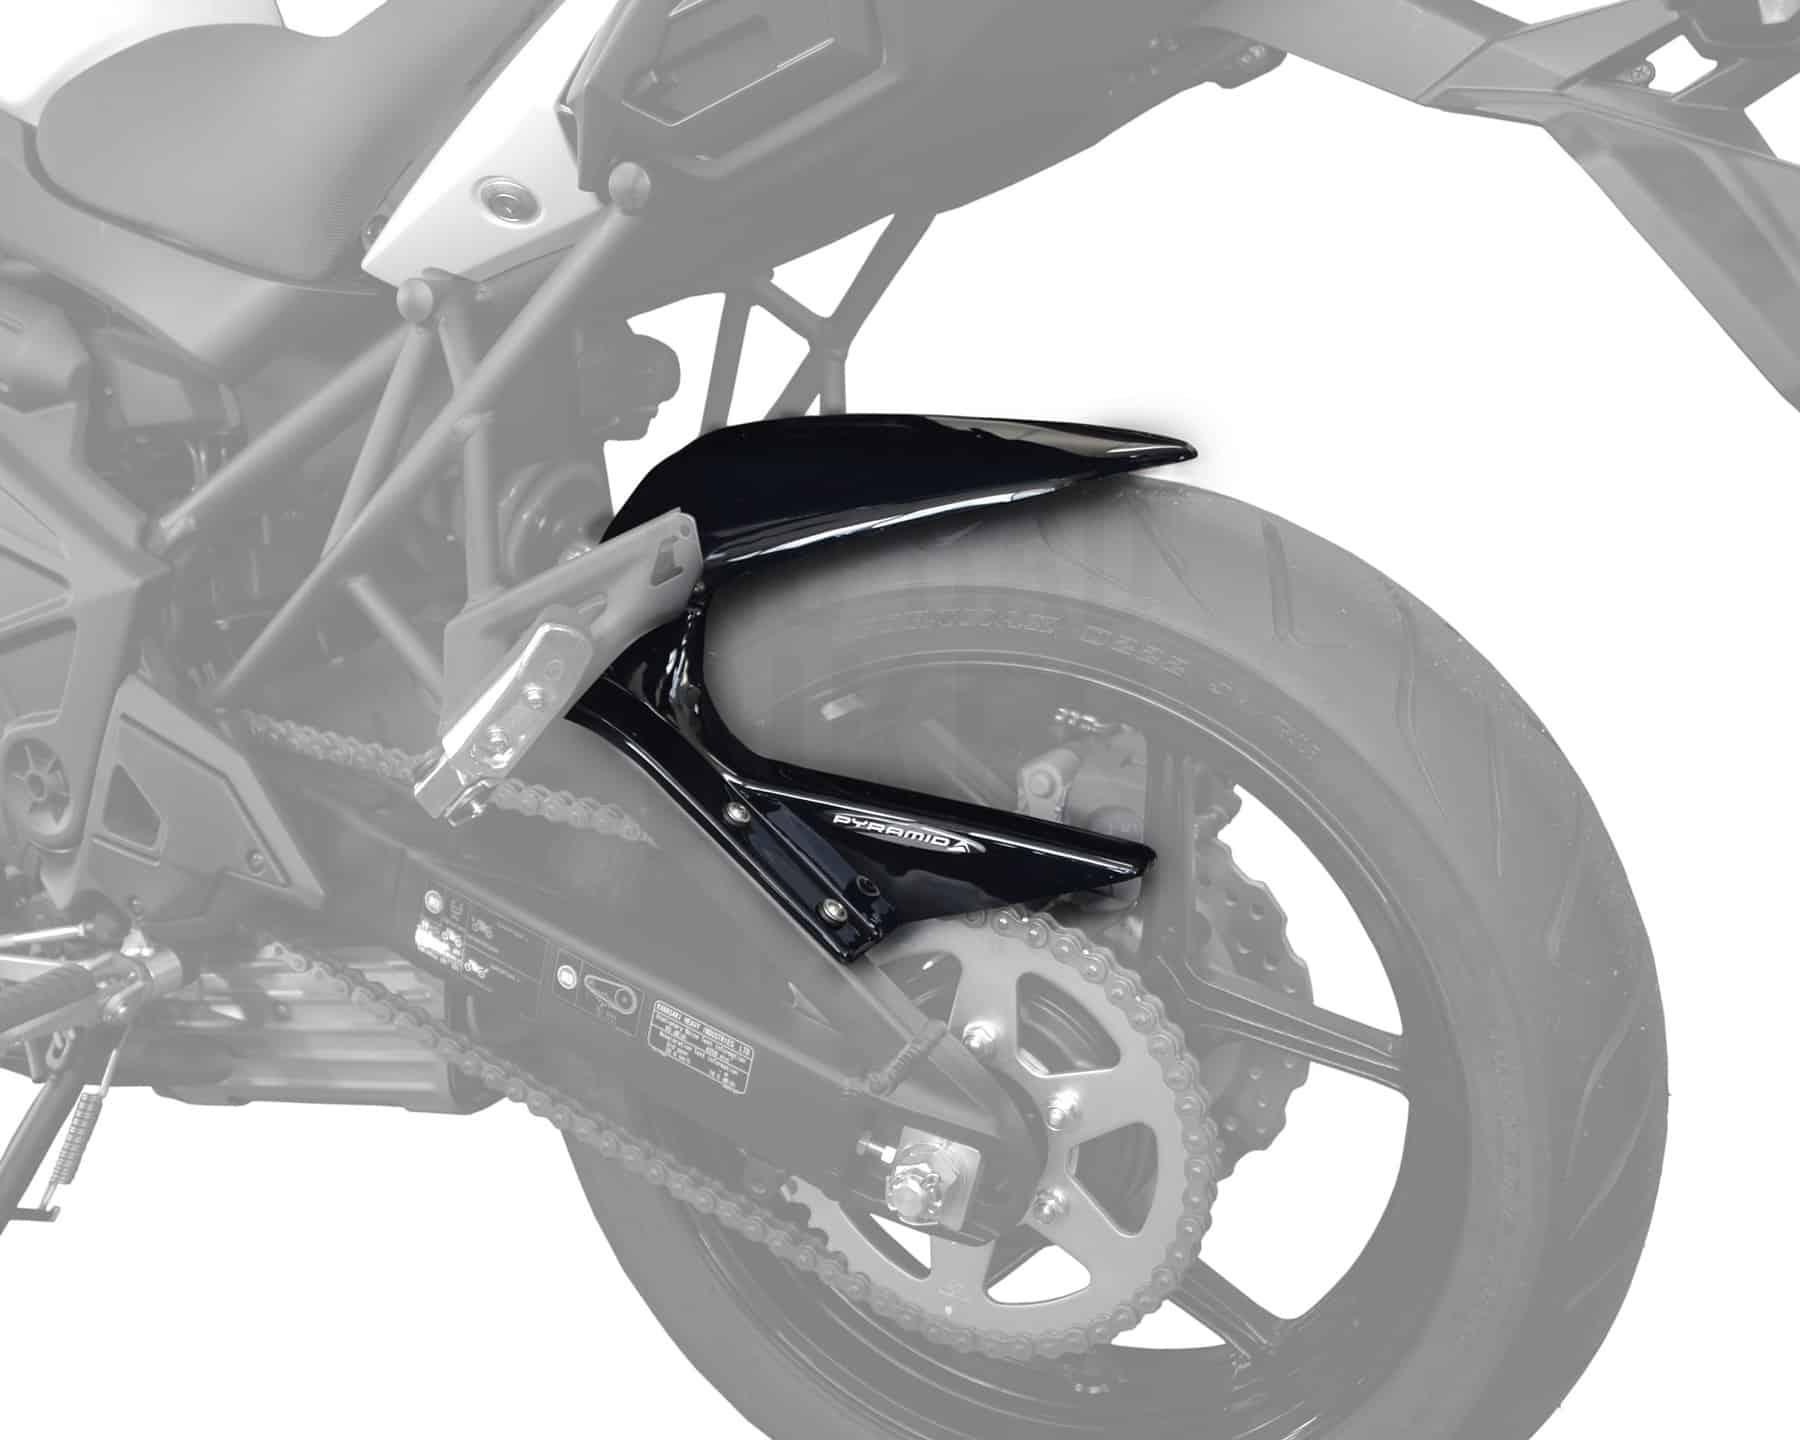 073850B Kawasaki Versys 650